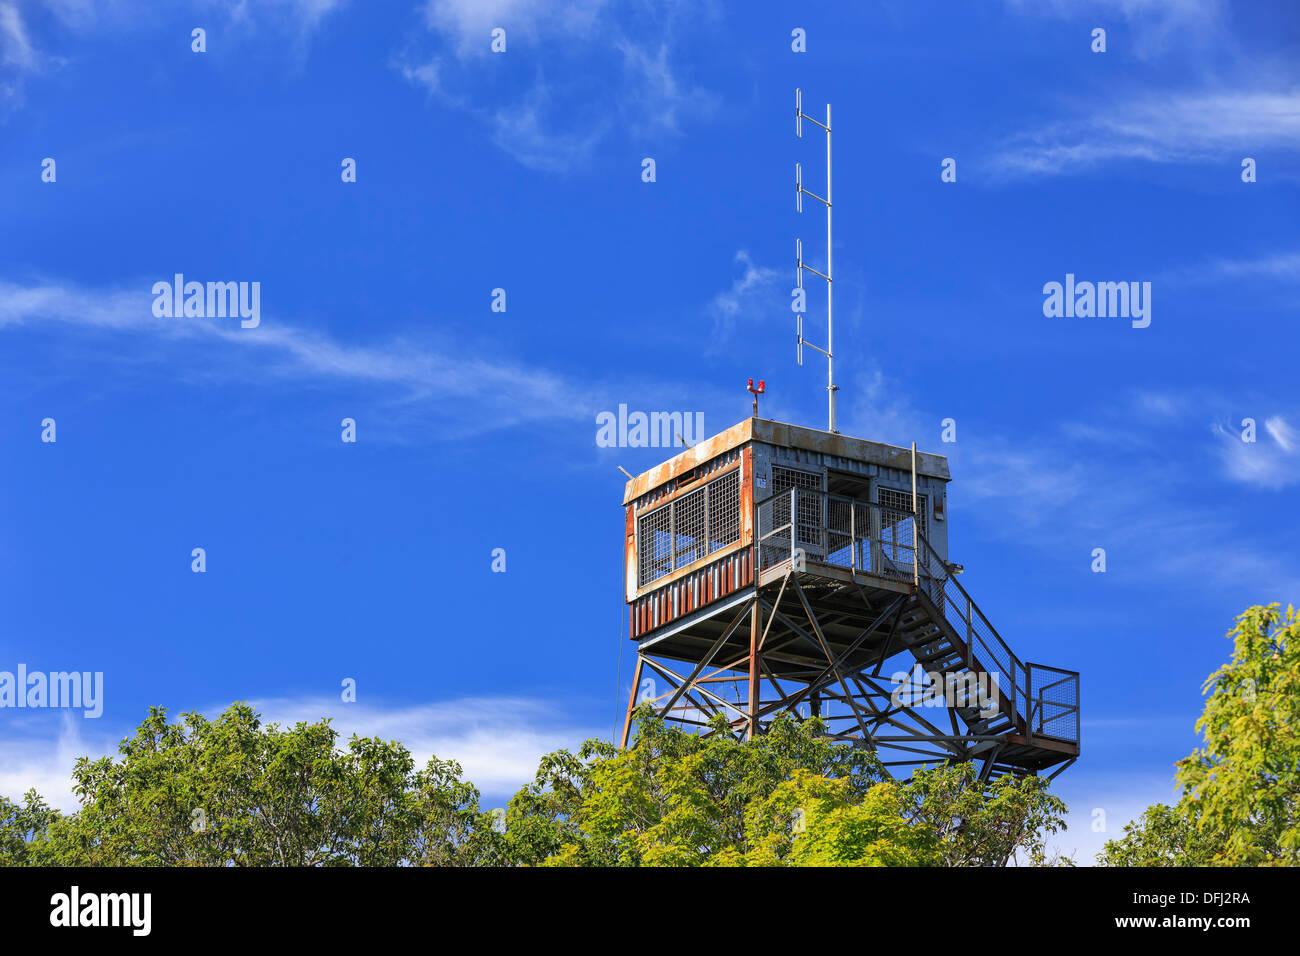 Dorset Fire Tower lookout, Dorset, Ontario, Canada - Stock Image